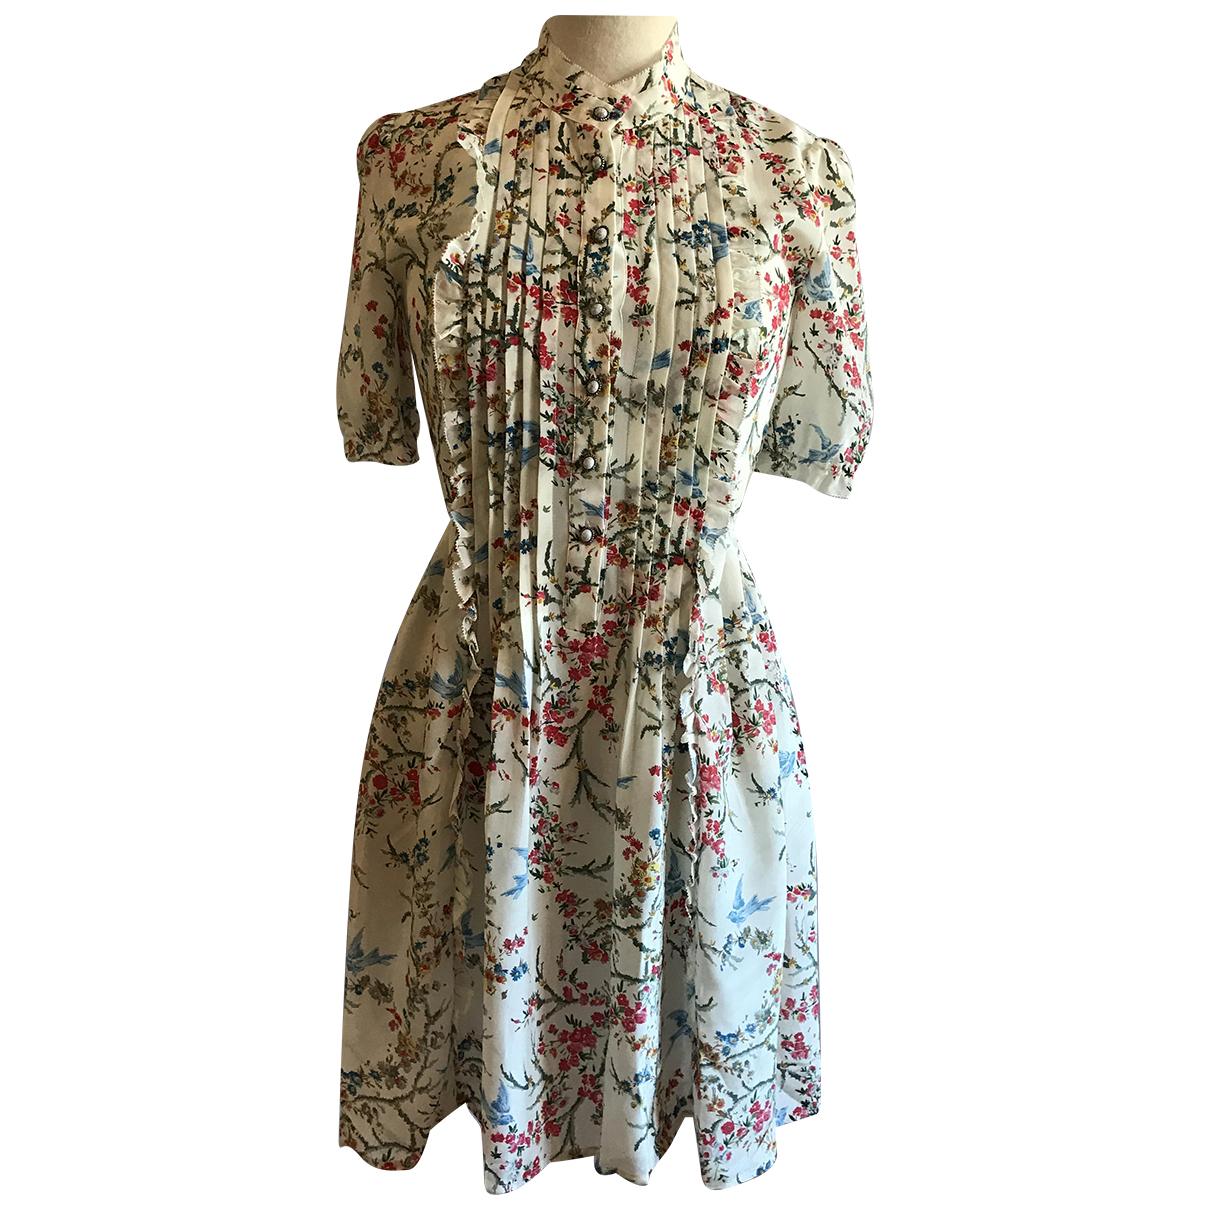 Mini vestido Spring Summer 2020 de Seda The Kooples